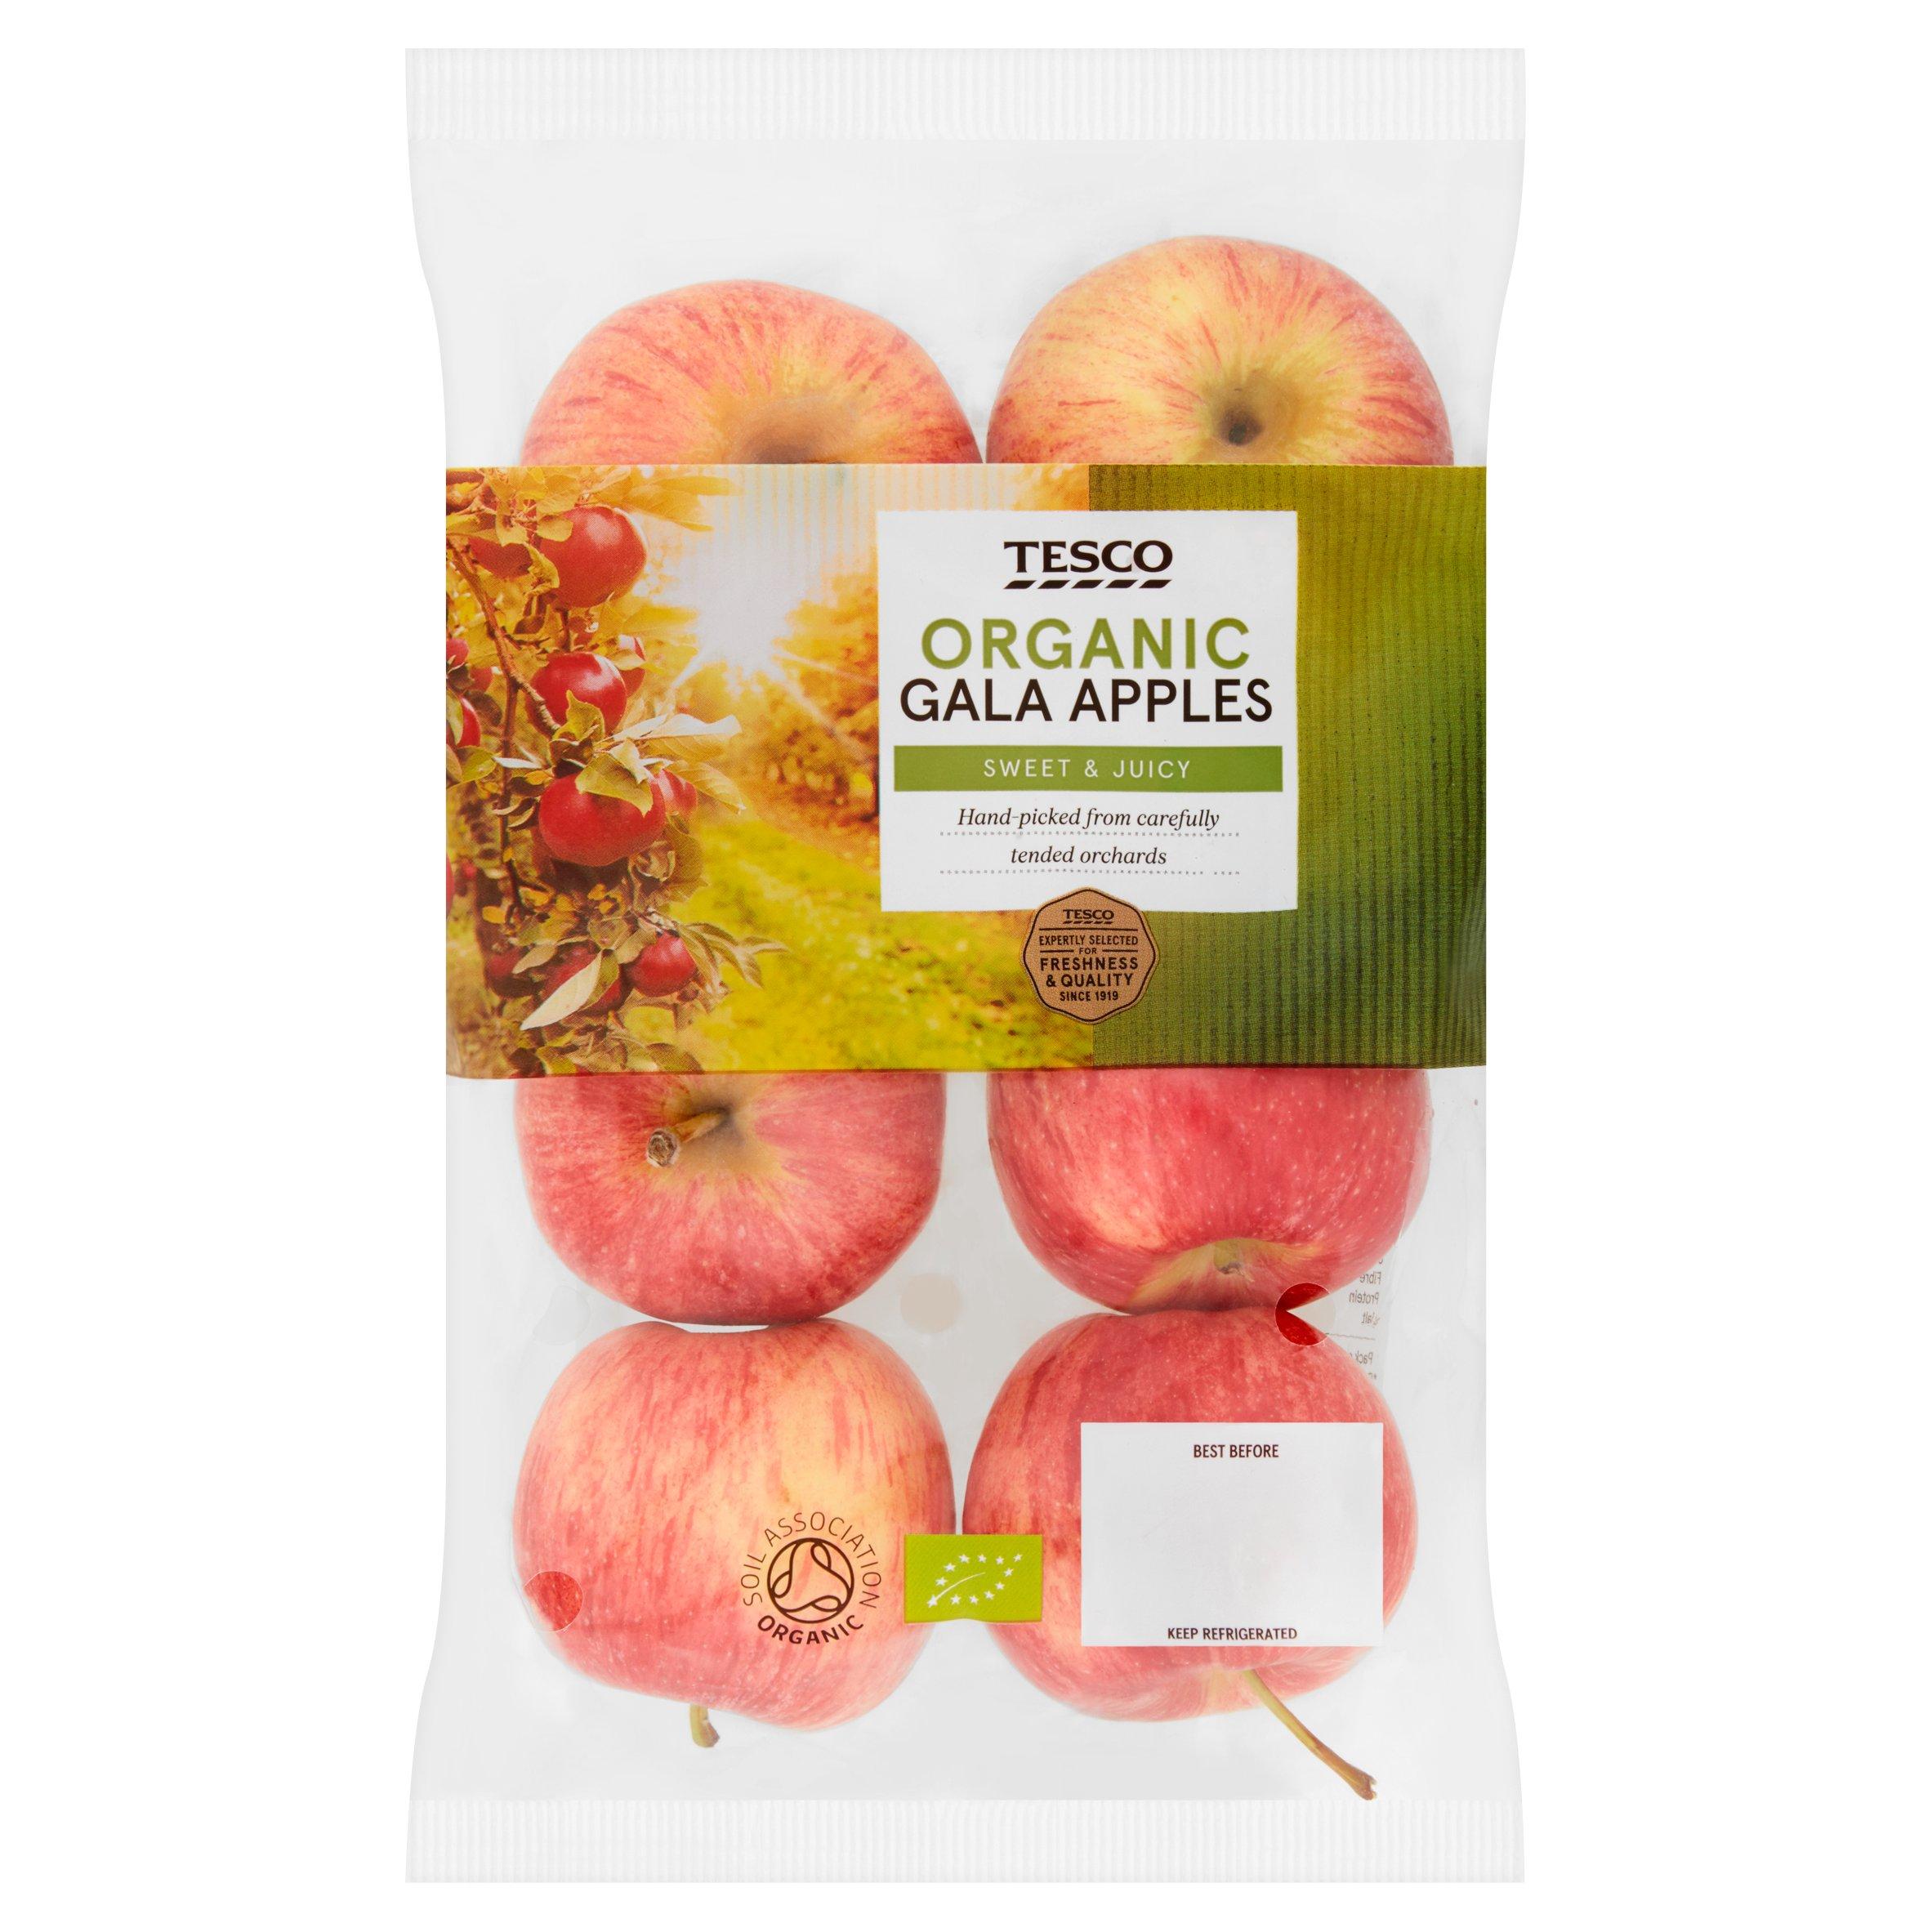 Tesco Organic Gala Apples 630G